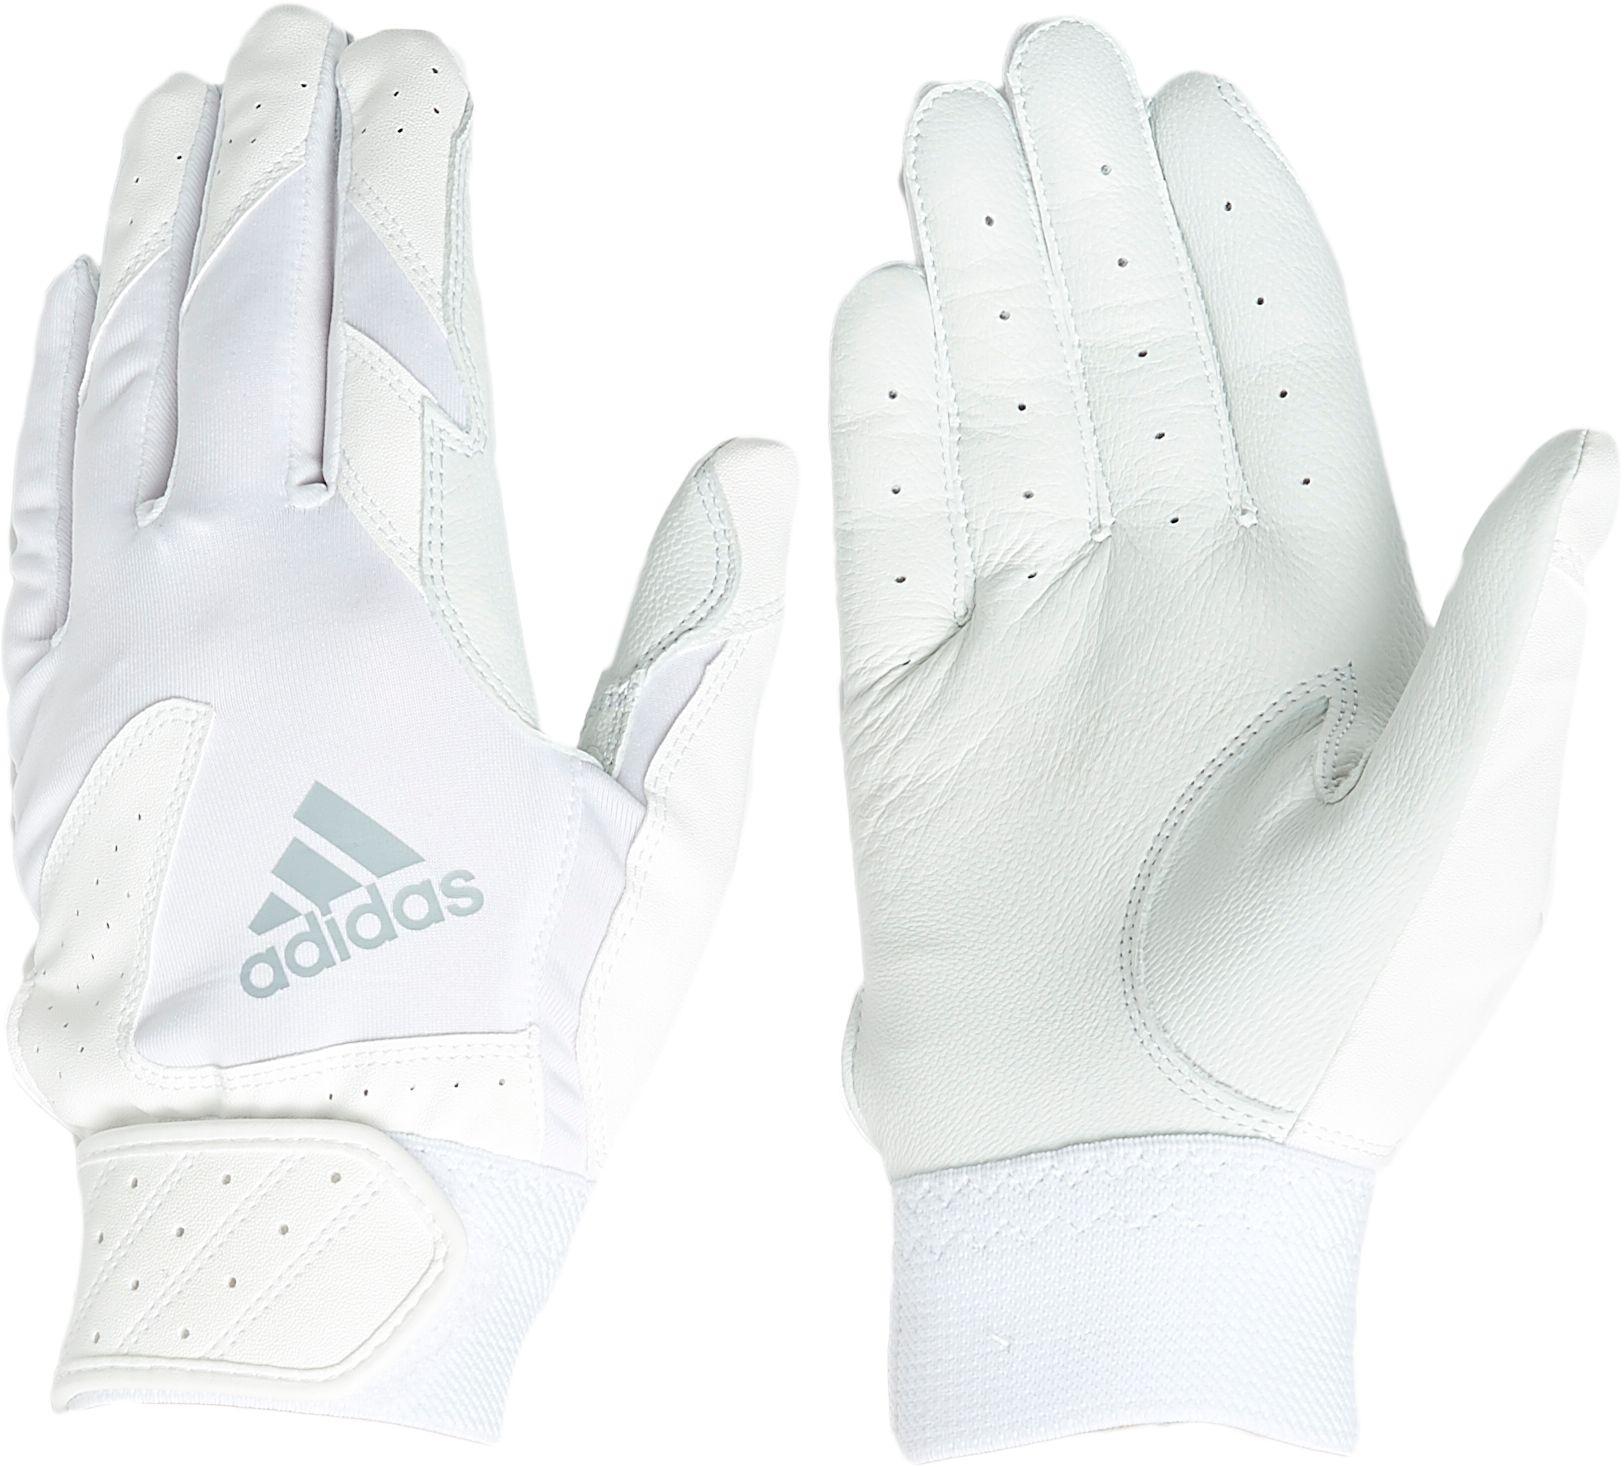 Adidas Youth Trilogy Batting Gloves In 2020 Batting Gloves Adidas Gloves